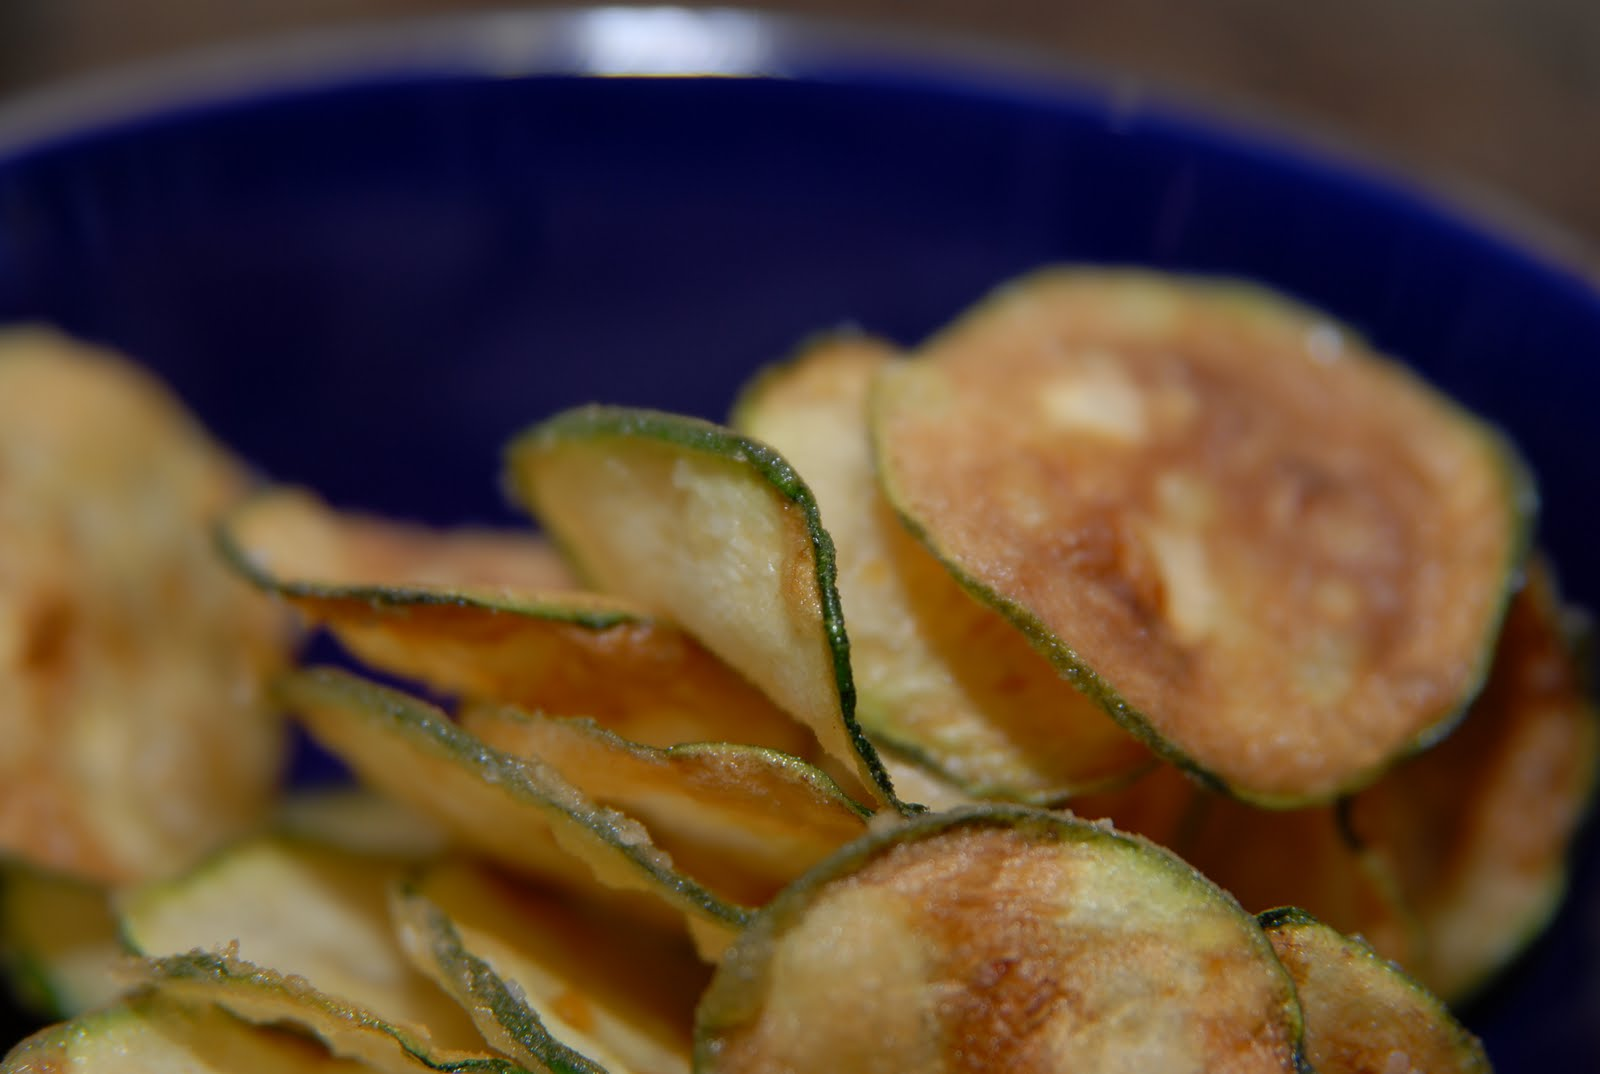 Aperitivos chips de calabacin